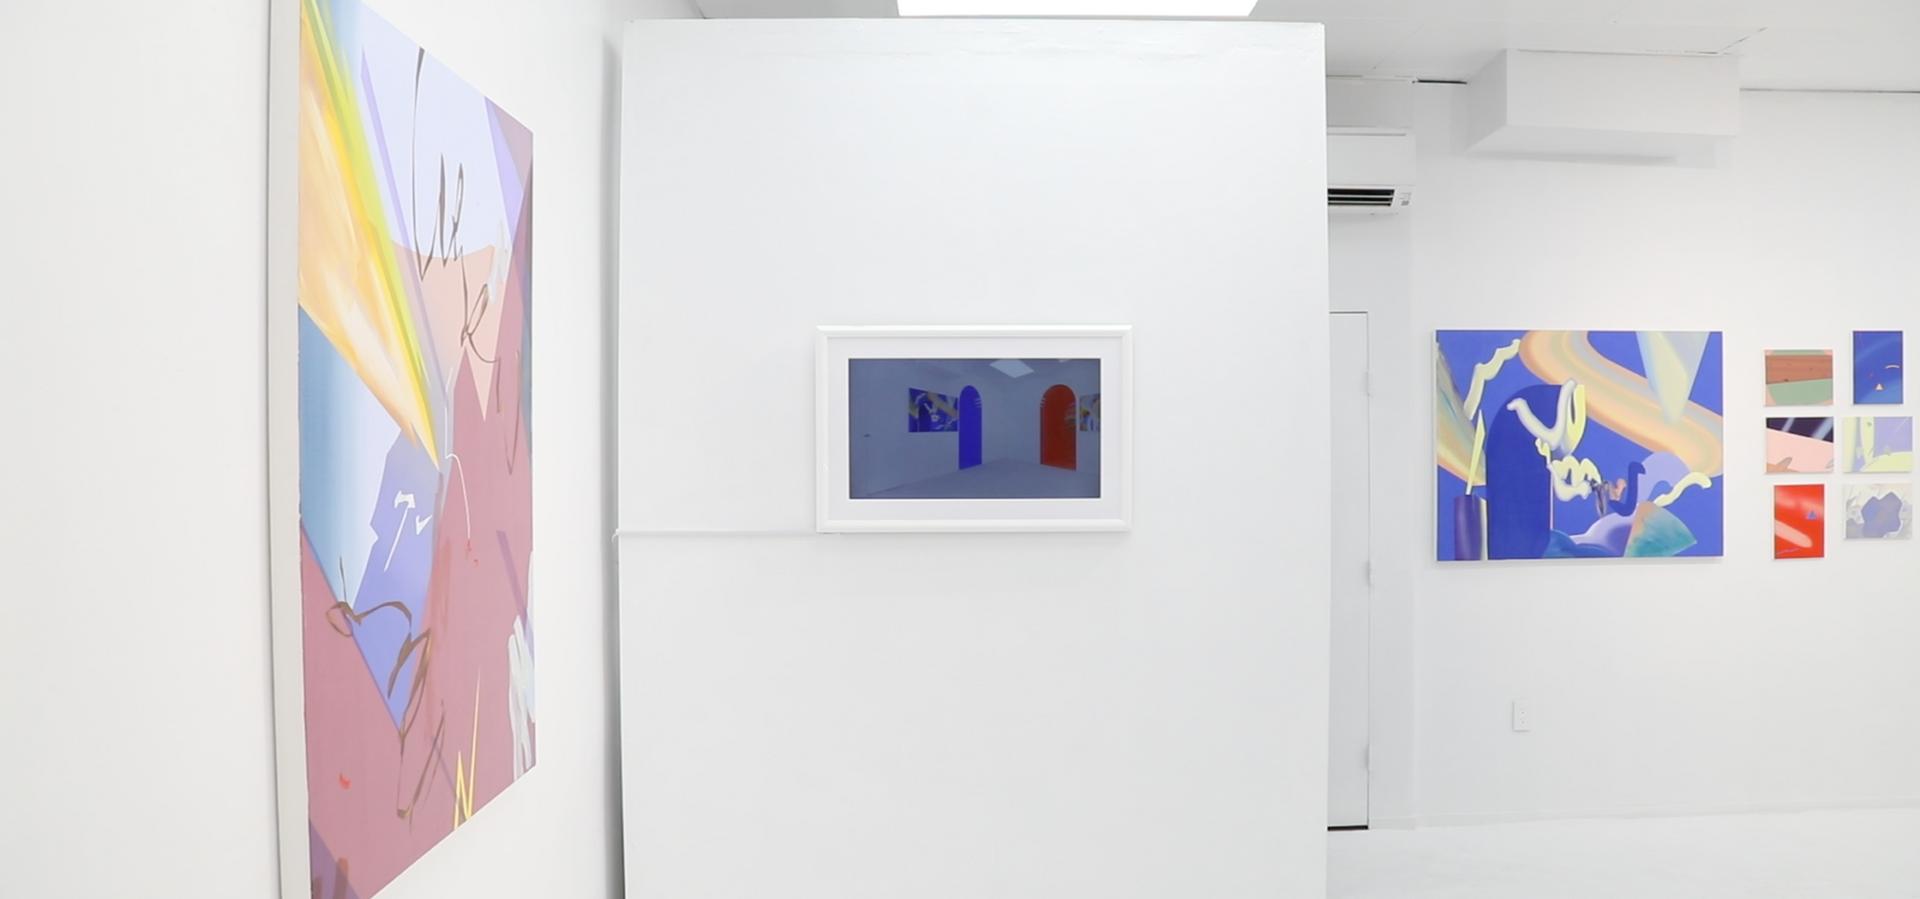 Jaena Kwon: Constellation-The Hidden Dimension